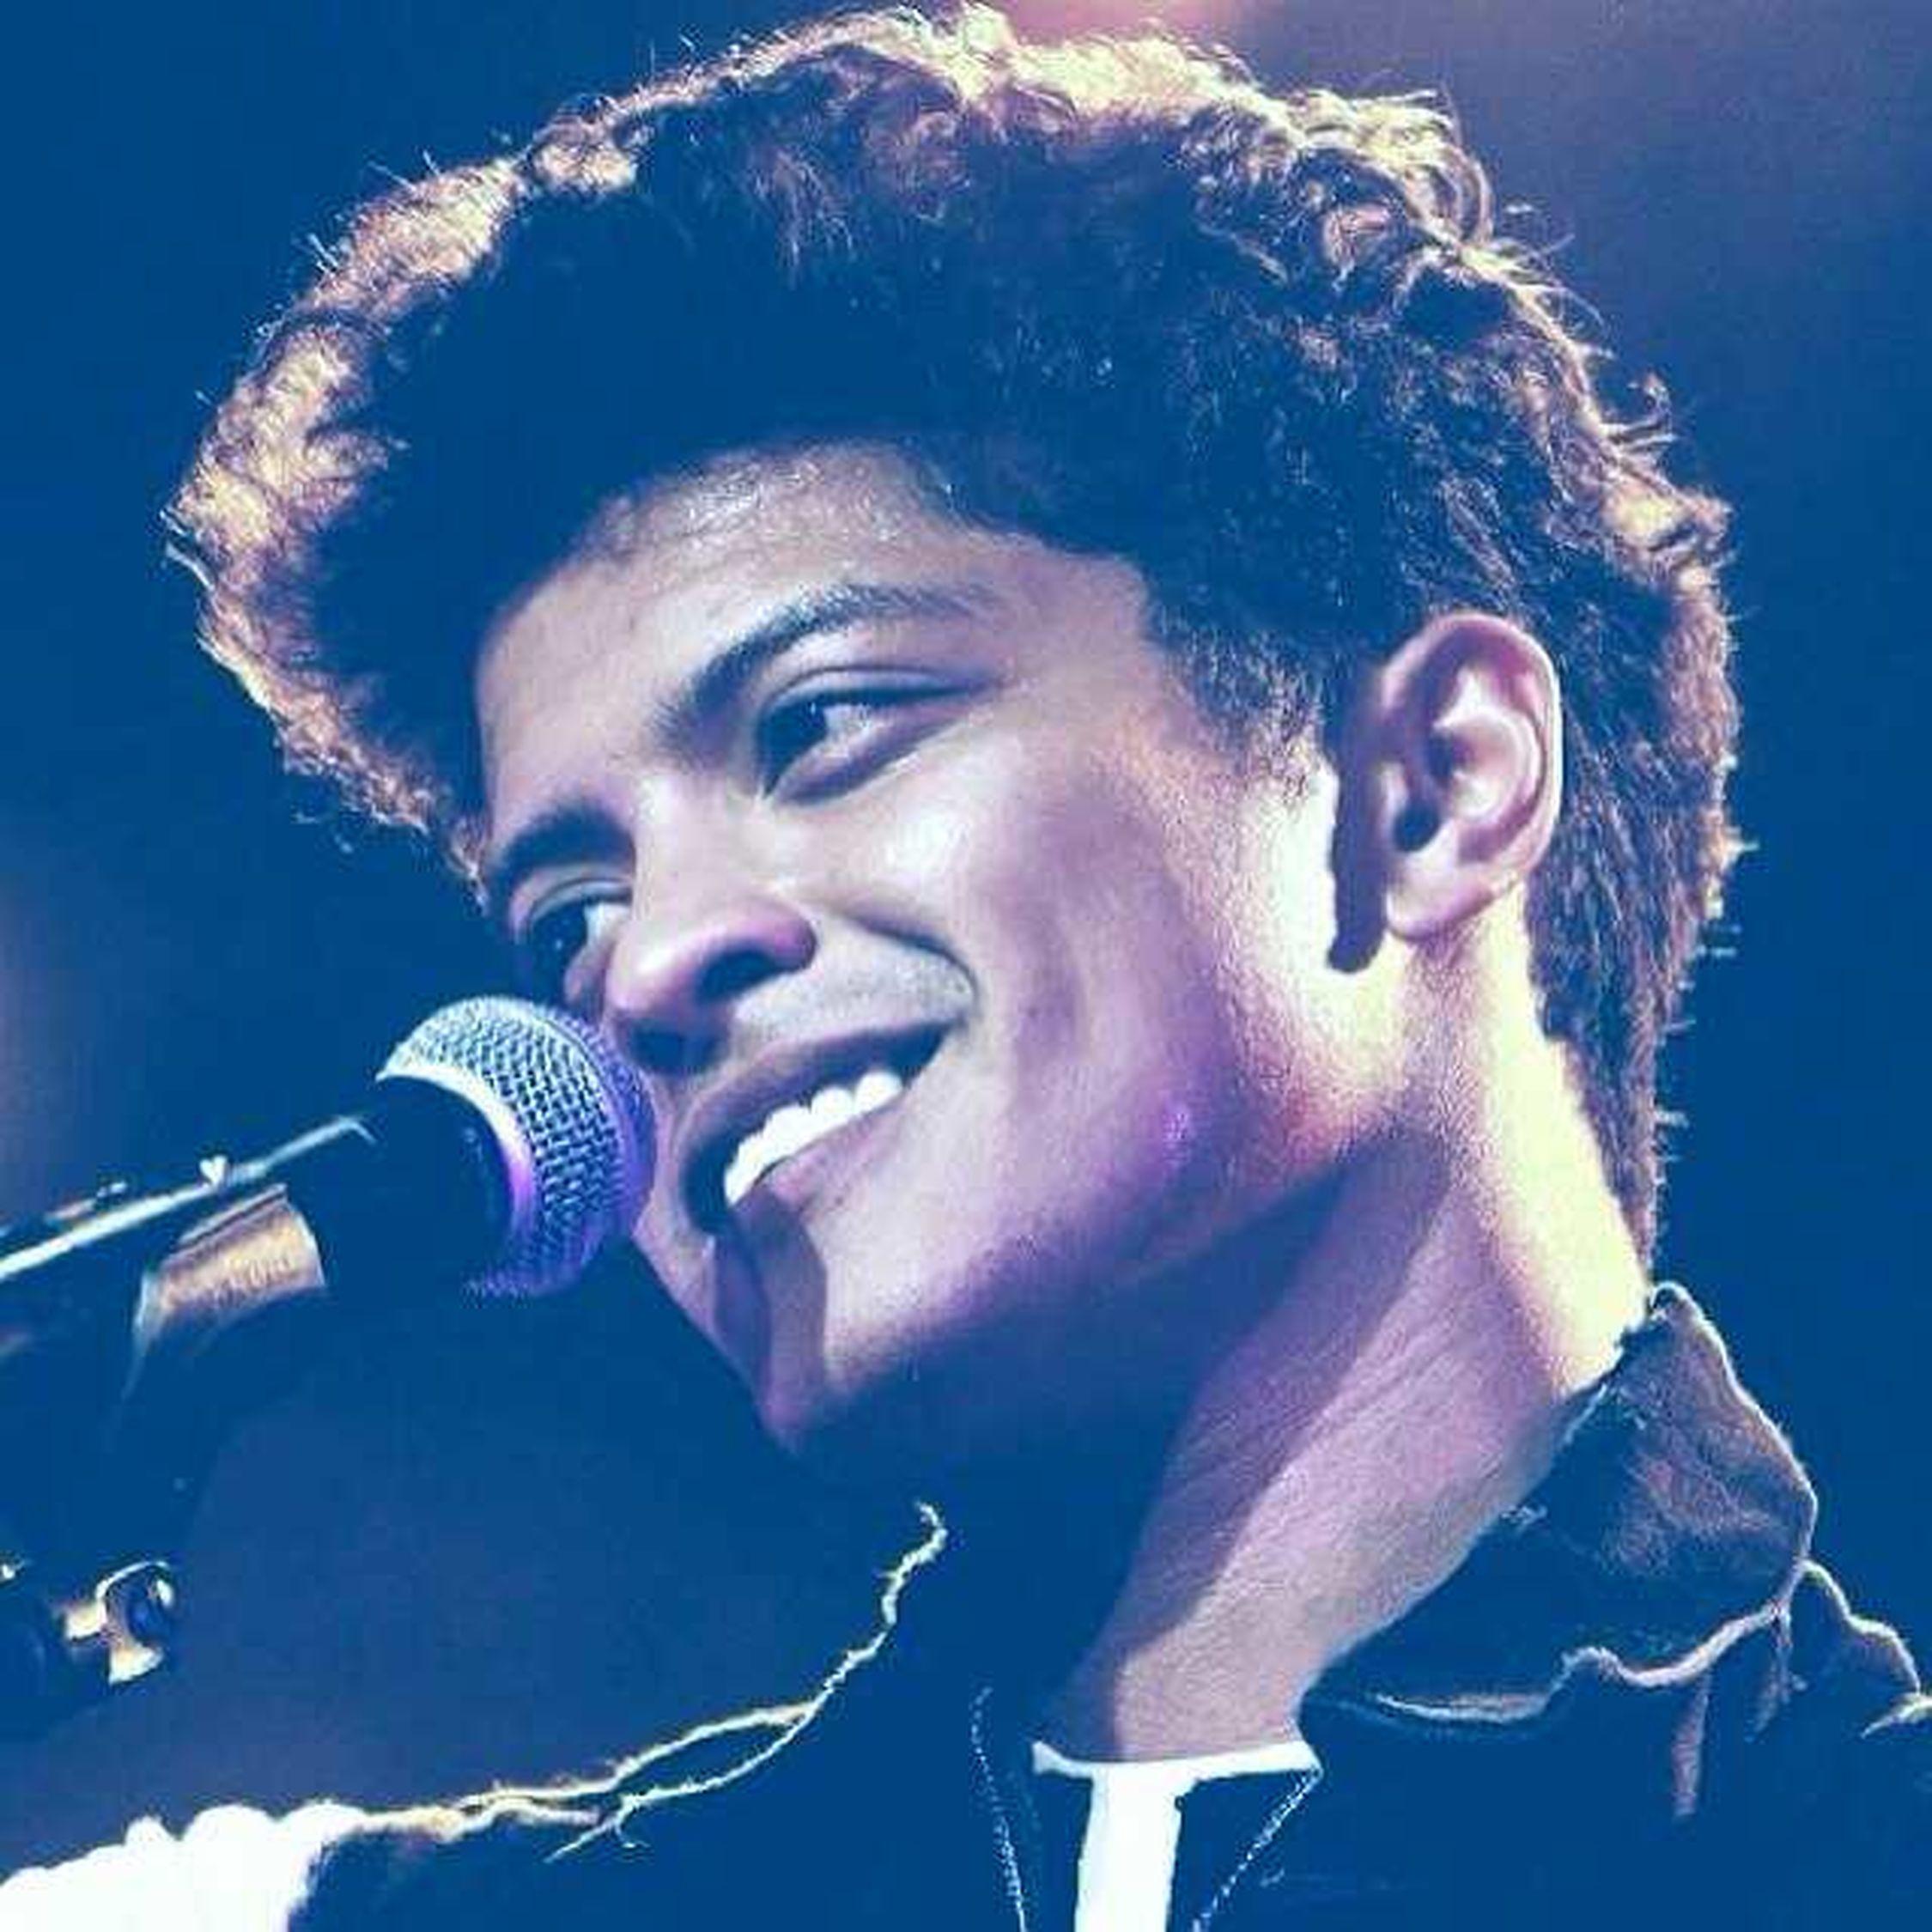 happy bday man i love u ♥,♥ Bruno Mars Hooligans Im Getting Sick :/ Wanna See Him In Person